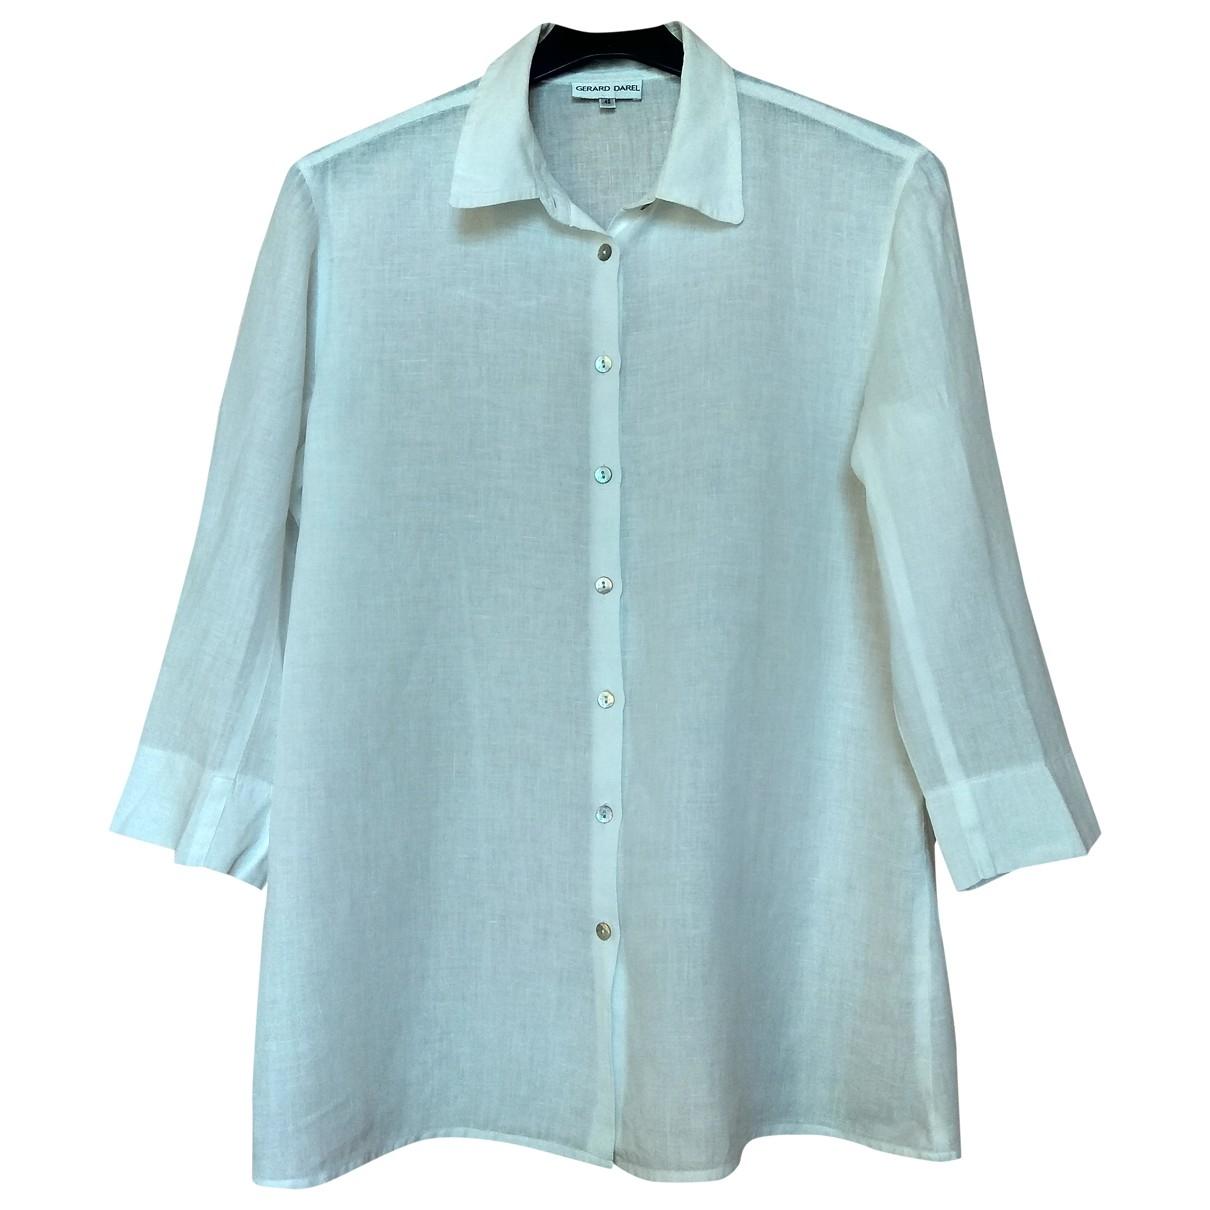 Gerard Darel - Top   pour femme en lin - blanc